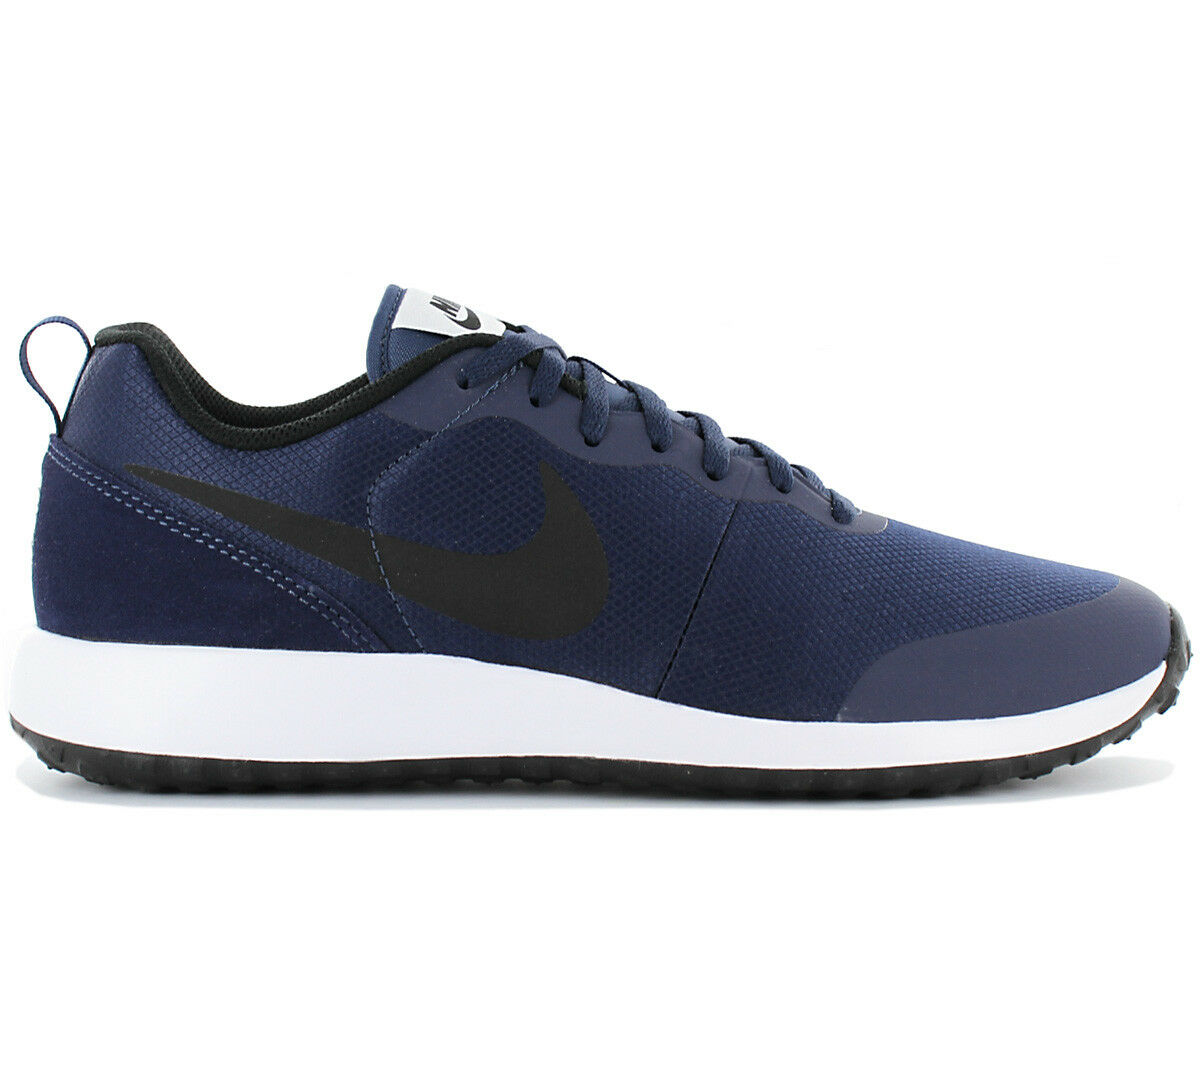 Nike Elite Shinsen Uomo  Shoes Gym Athletic 801780-400 New